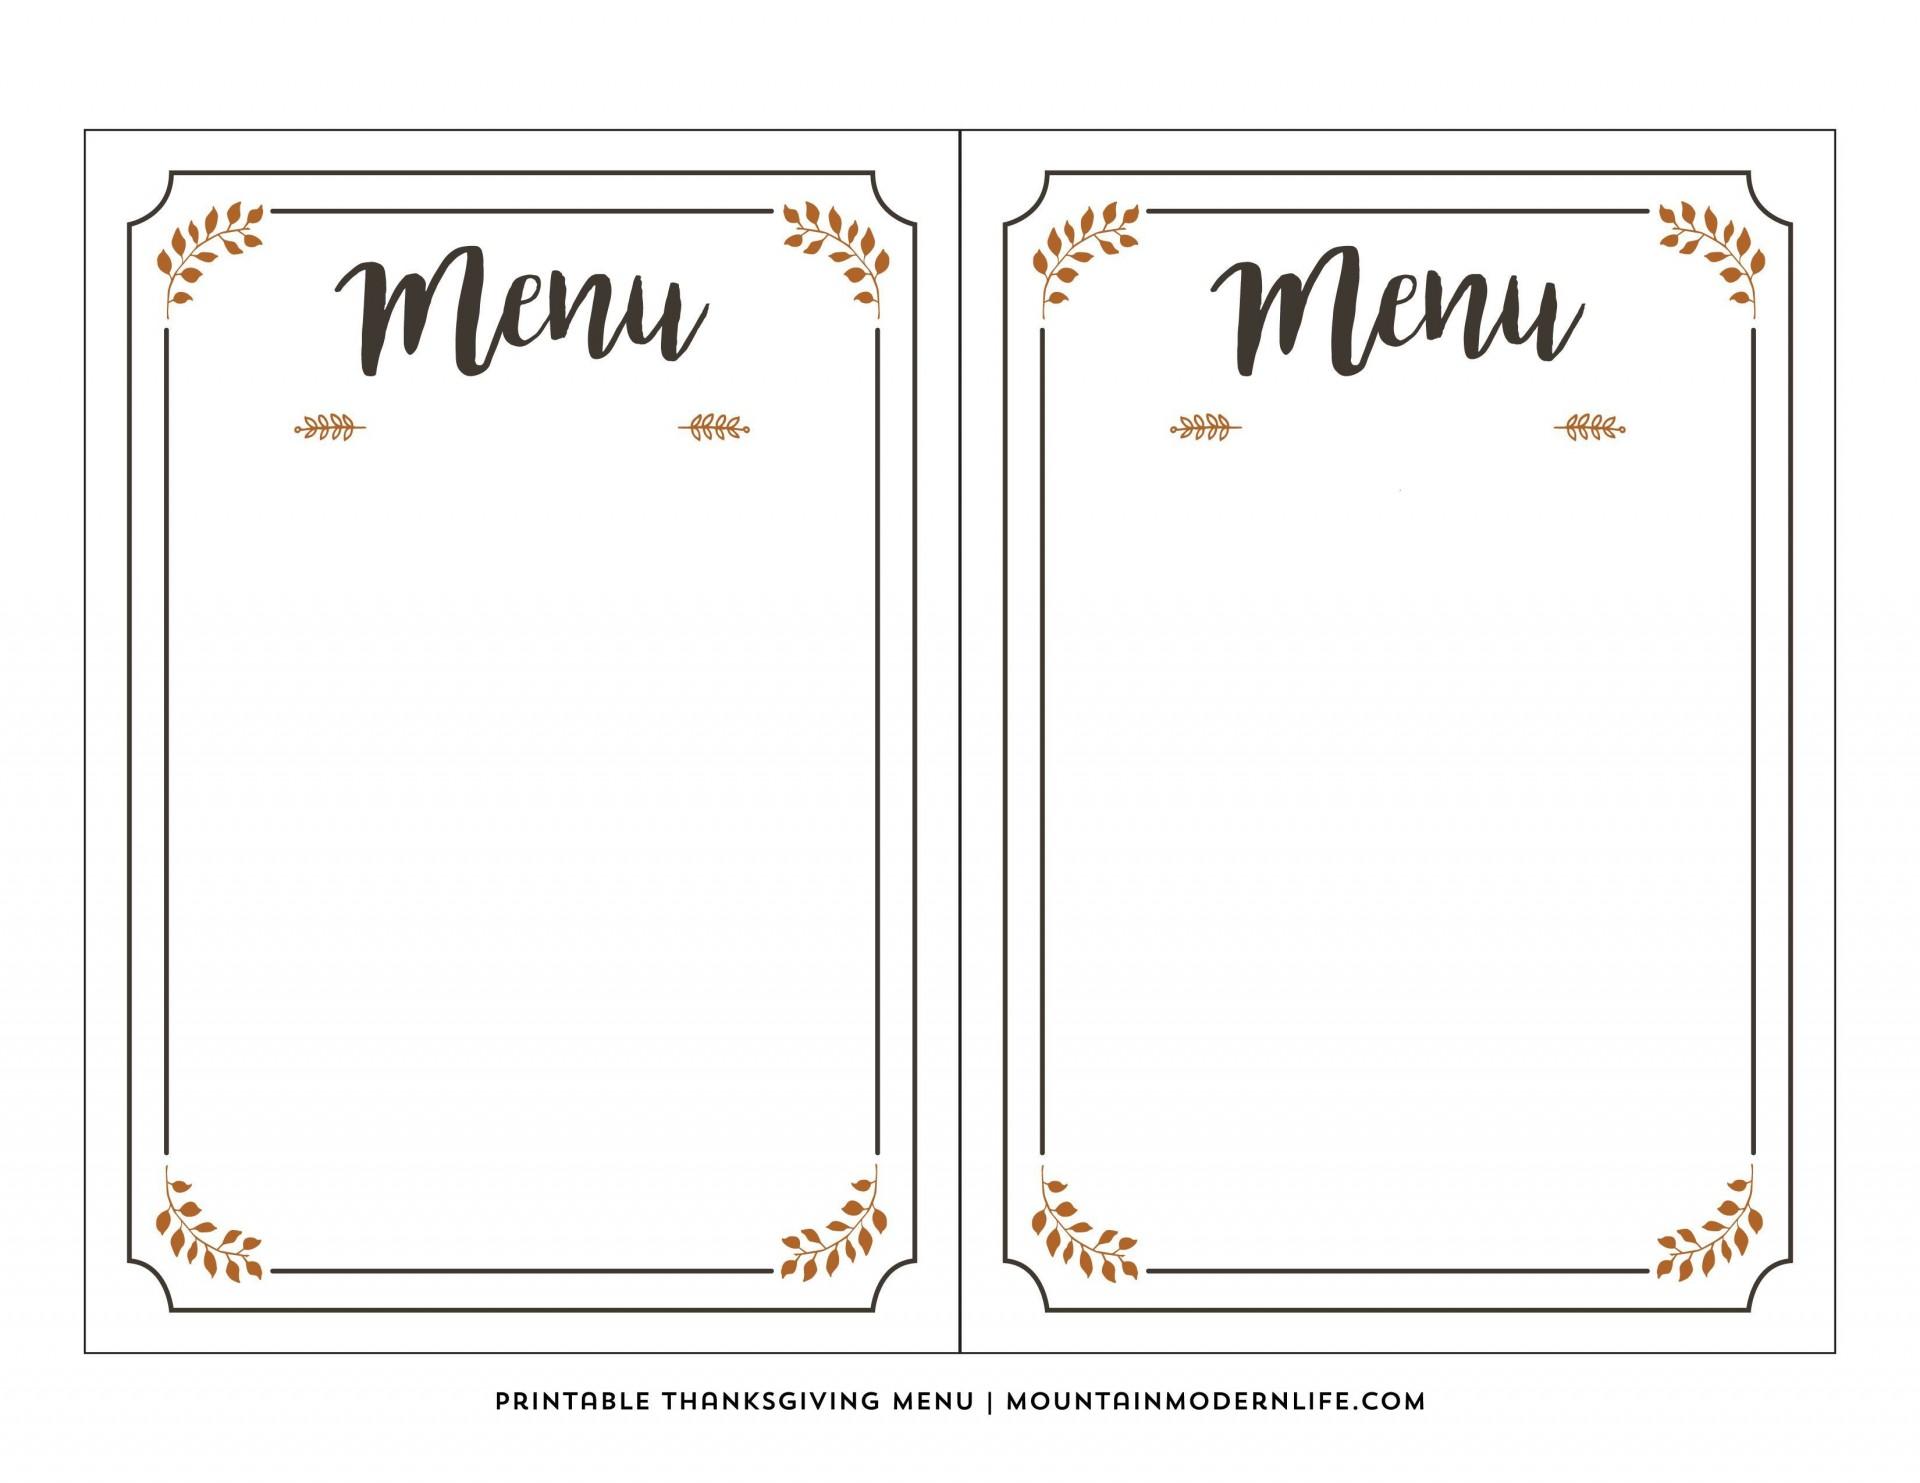 003 Phenomenal Free Printable Menu Template Photo  For Dinner Party Family1920